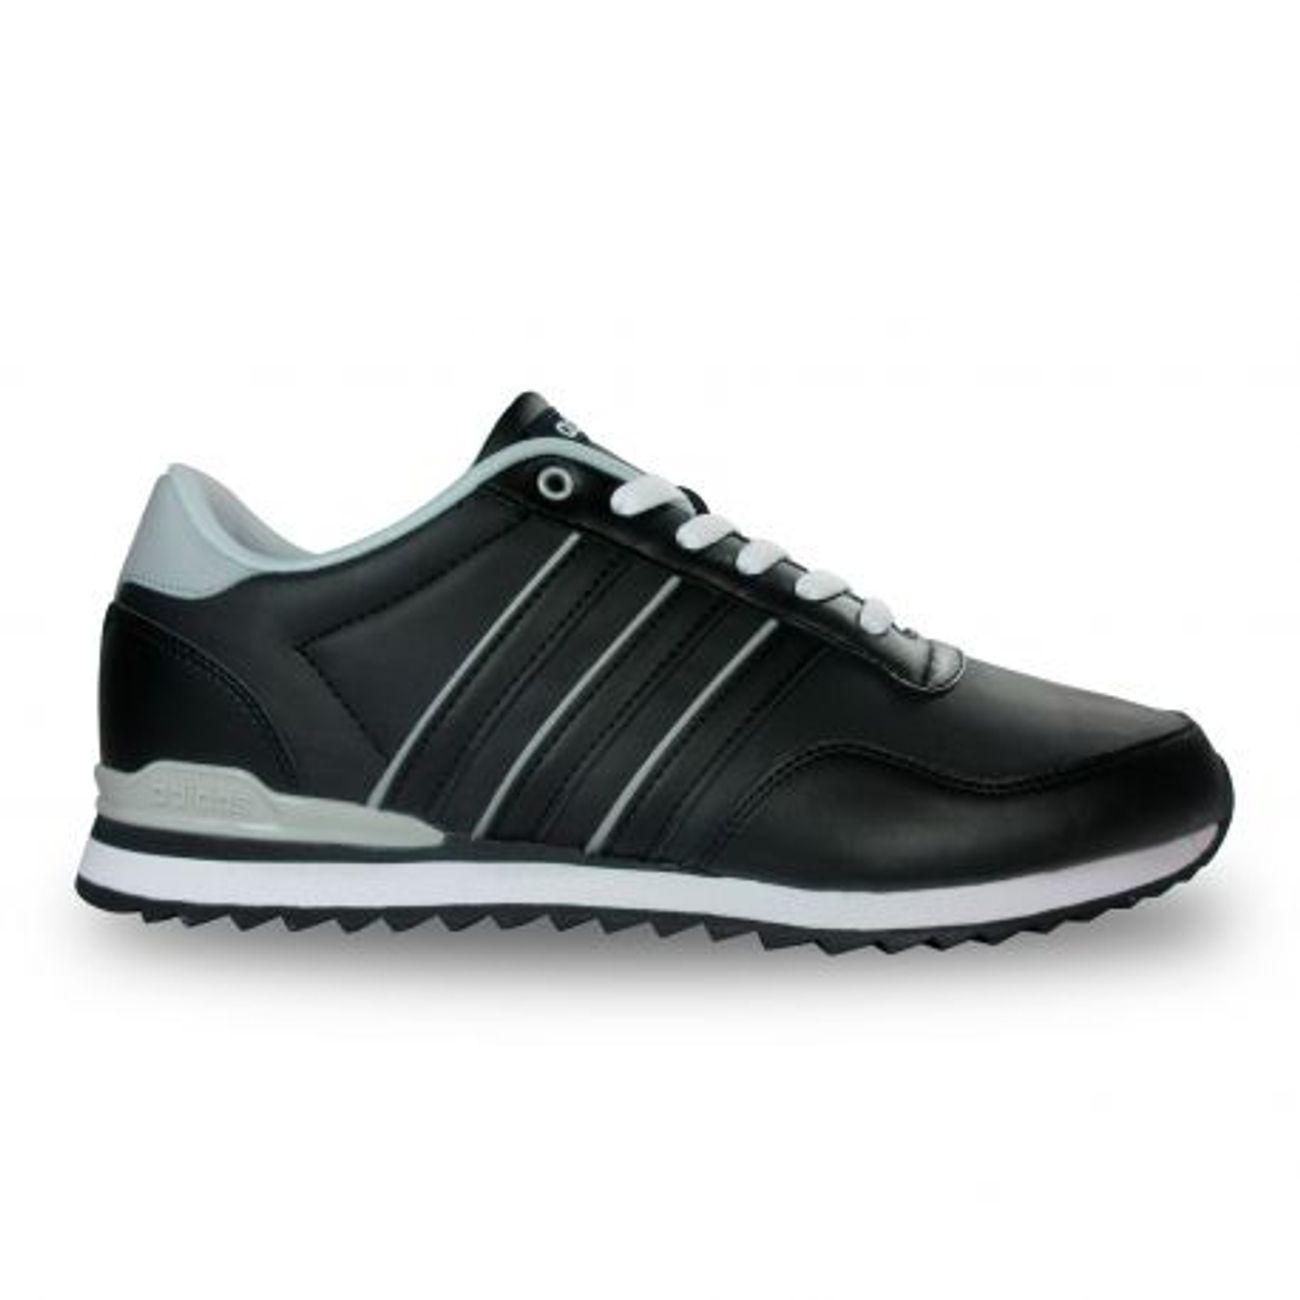 magasin en ligne f80cf d1458 Mode- Lifestyle homme ADIDAS Chaussure homme Jogger Cl adidas